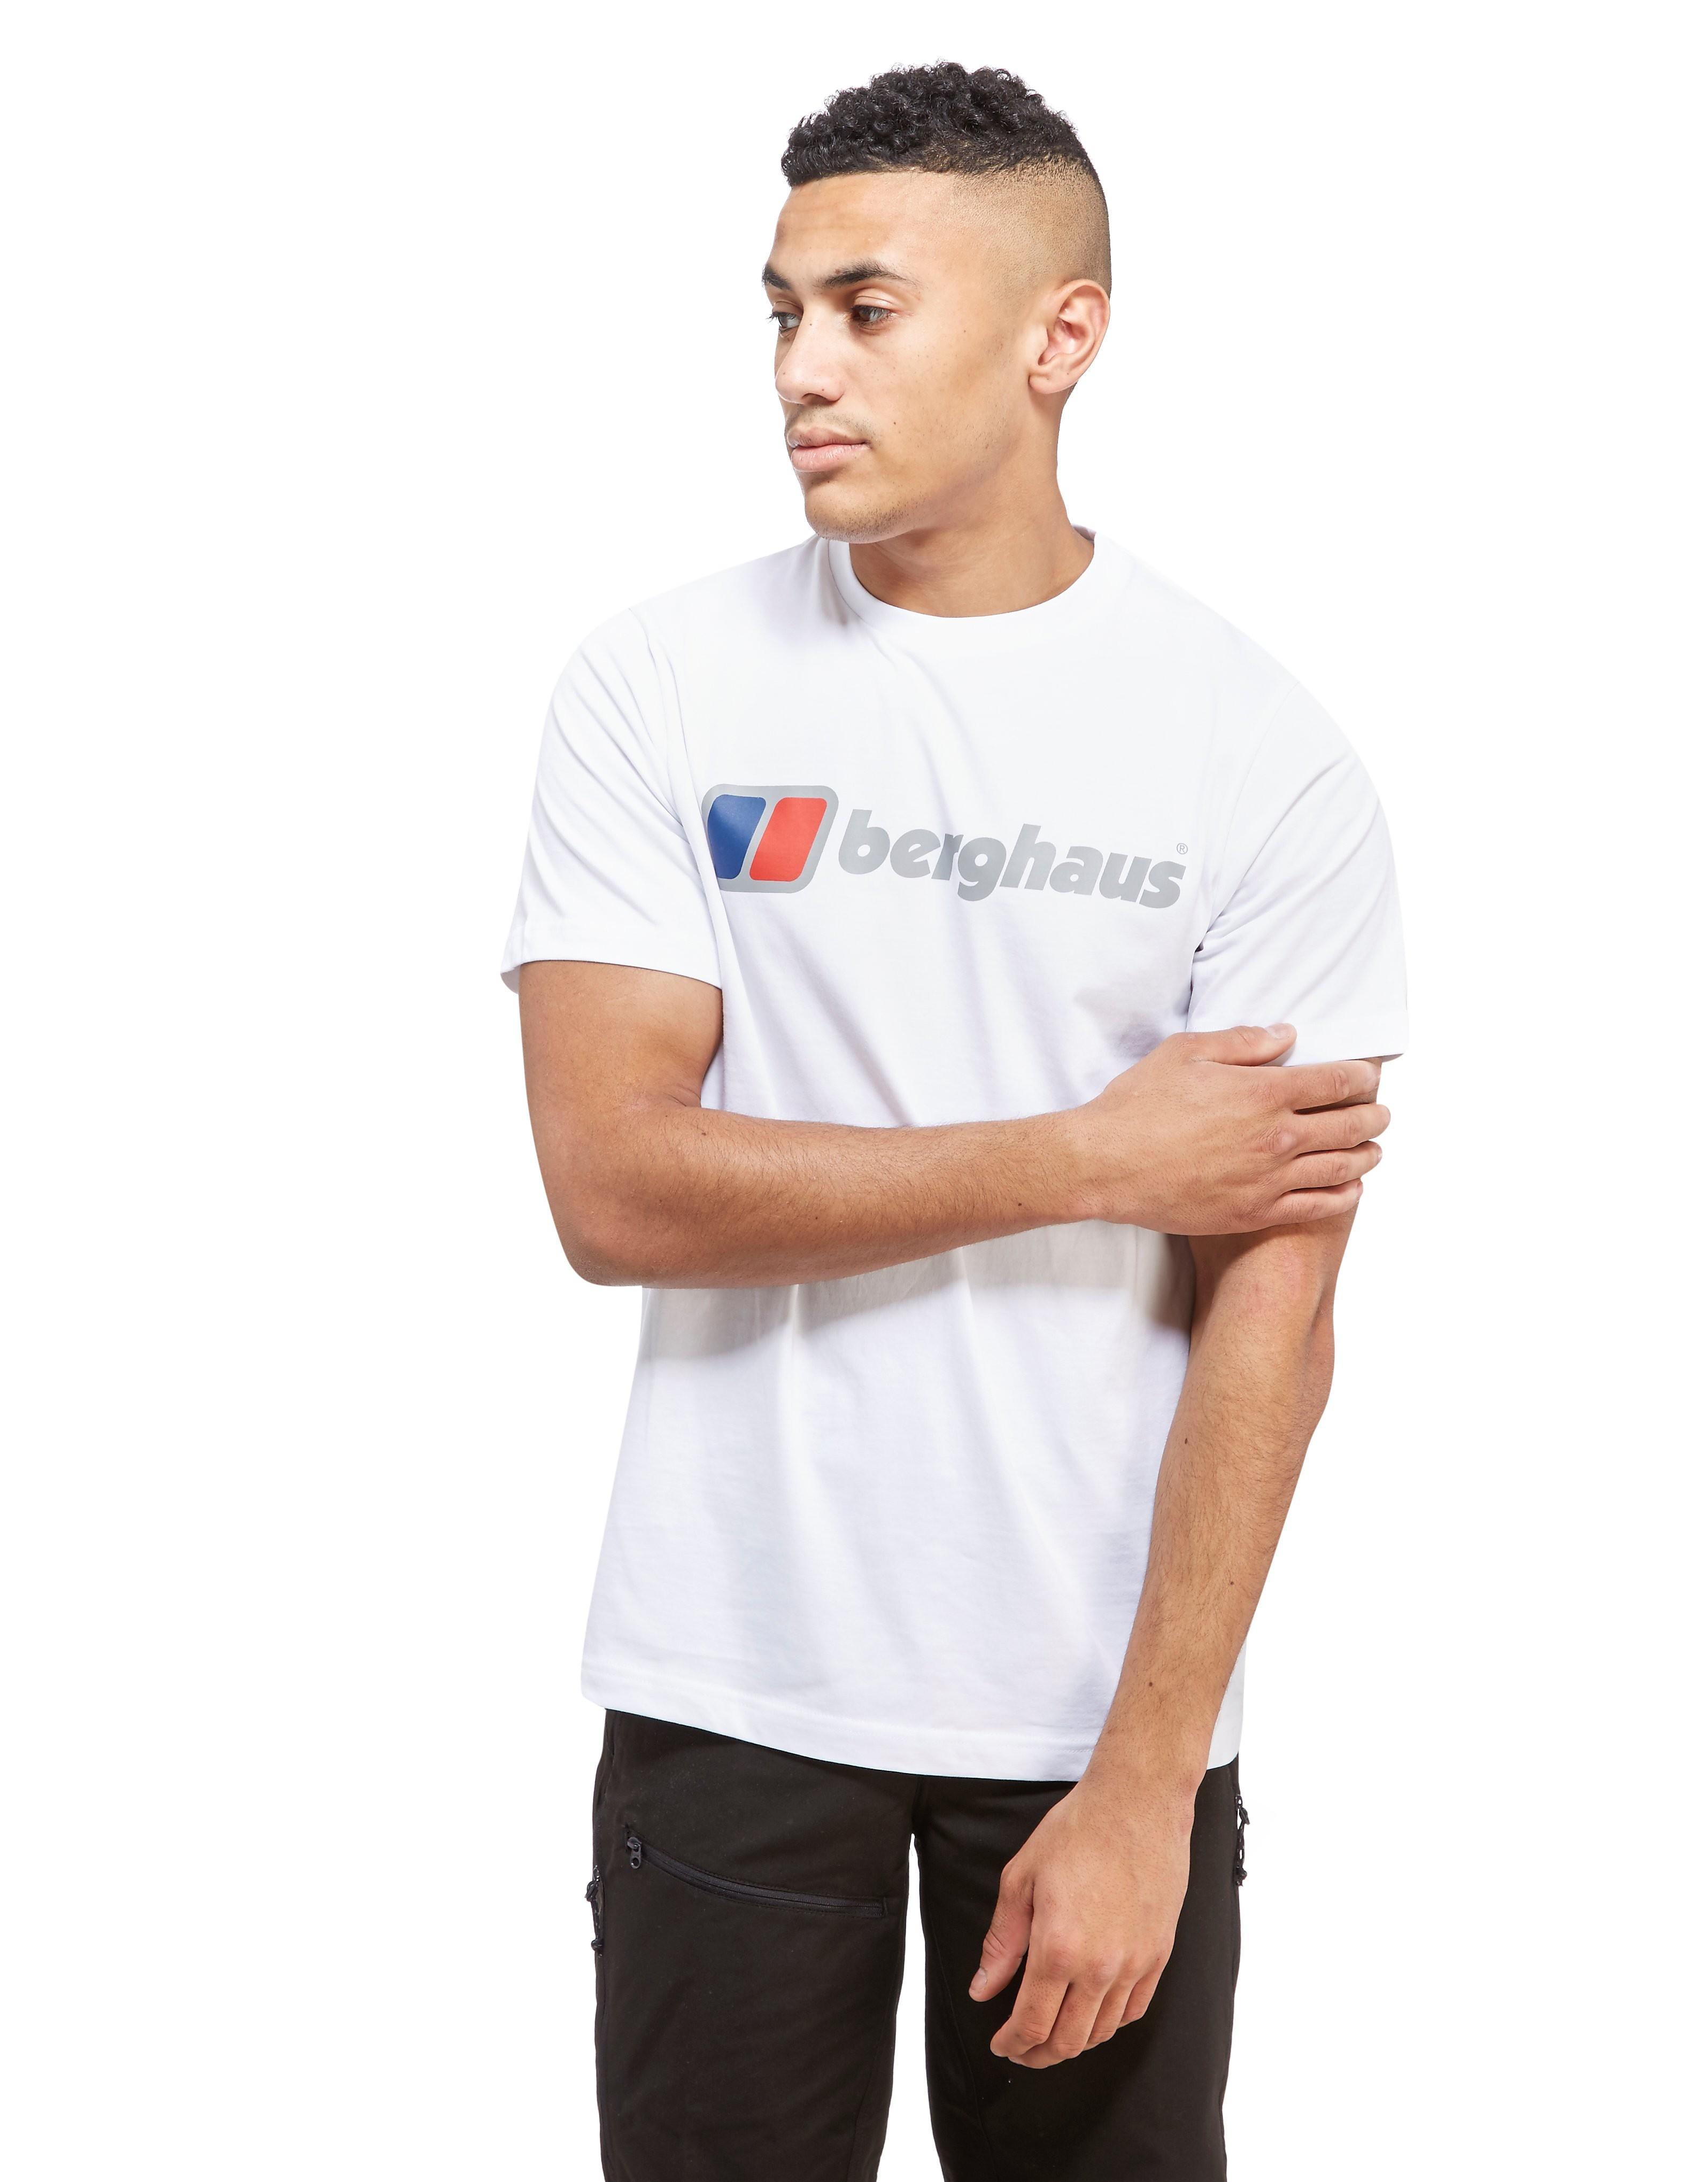 Berghaus Blocks 1 T-Shirt